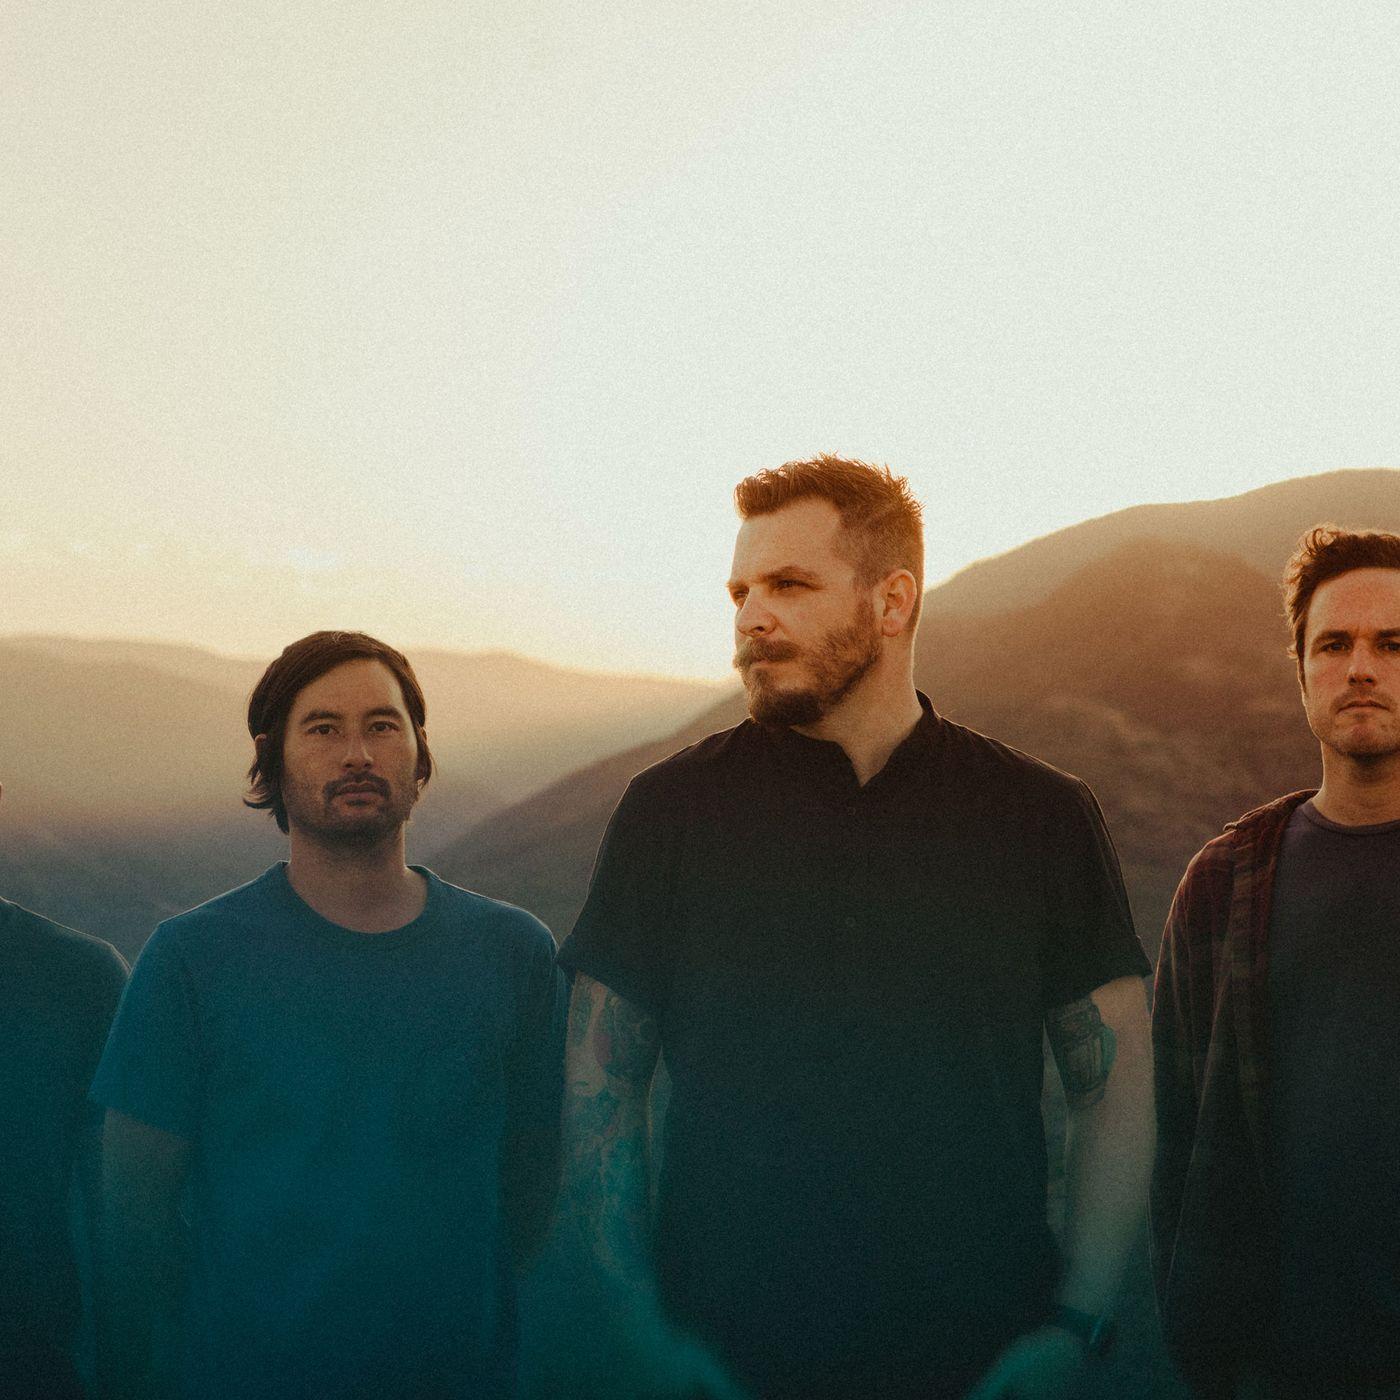 THRICE Broaden Their Horizons With New Album